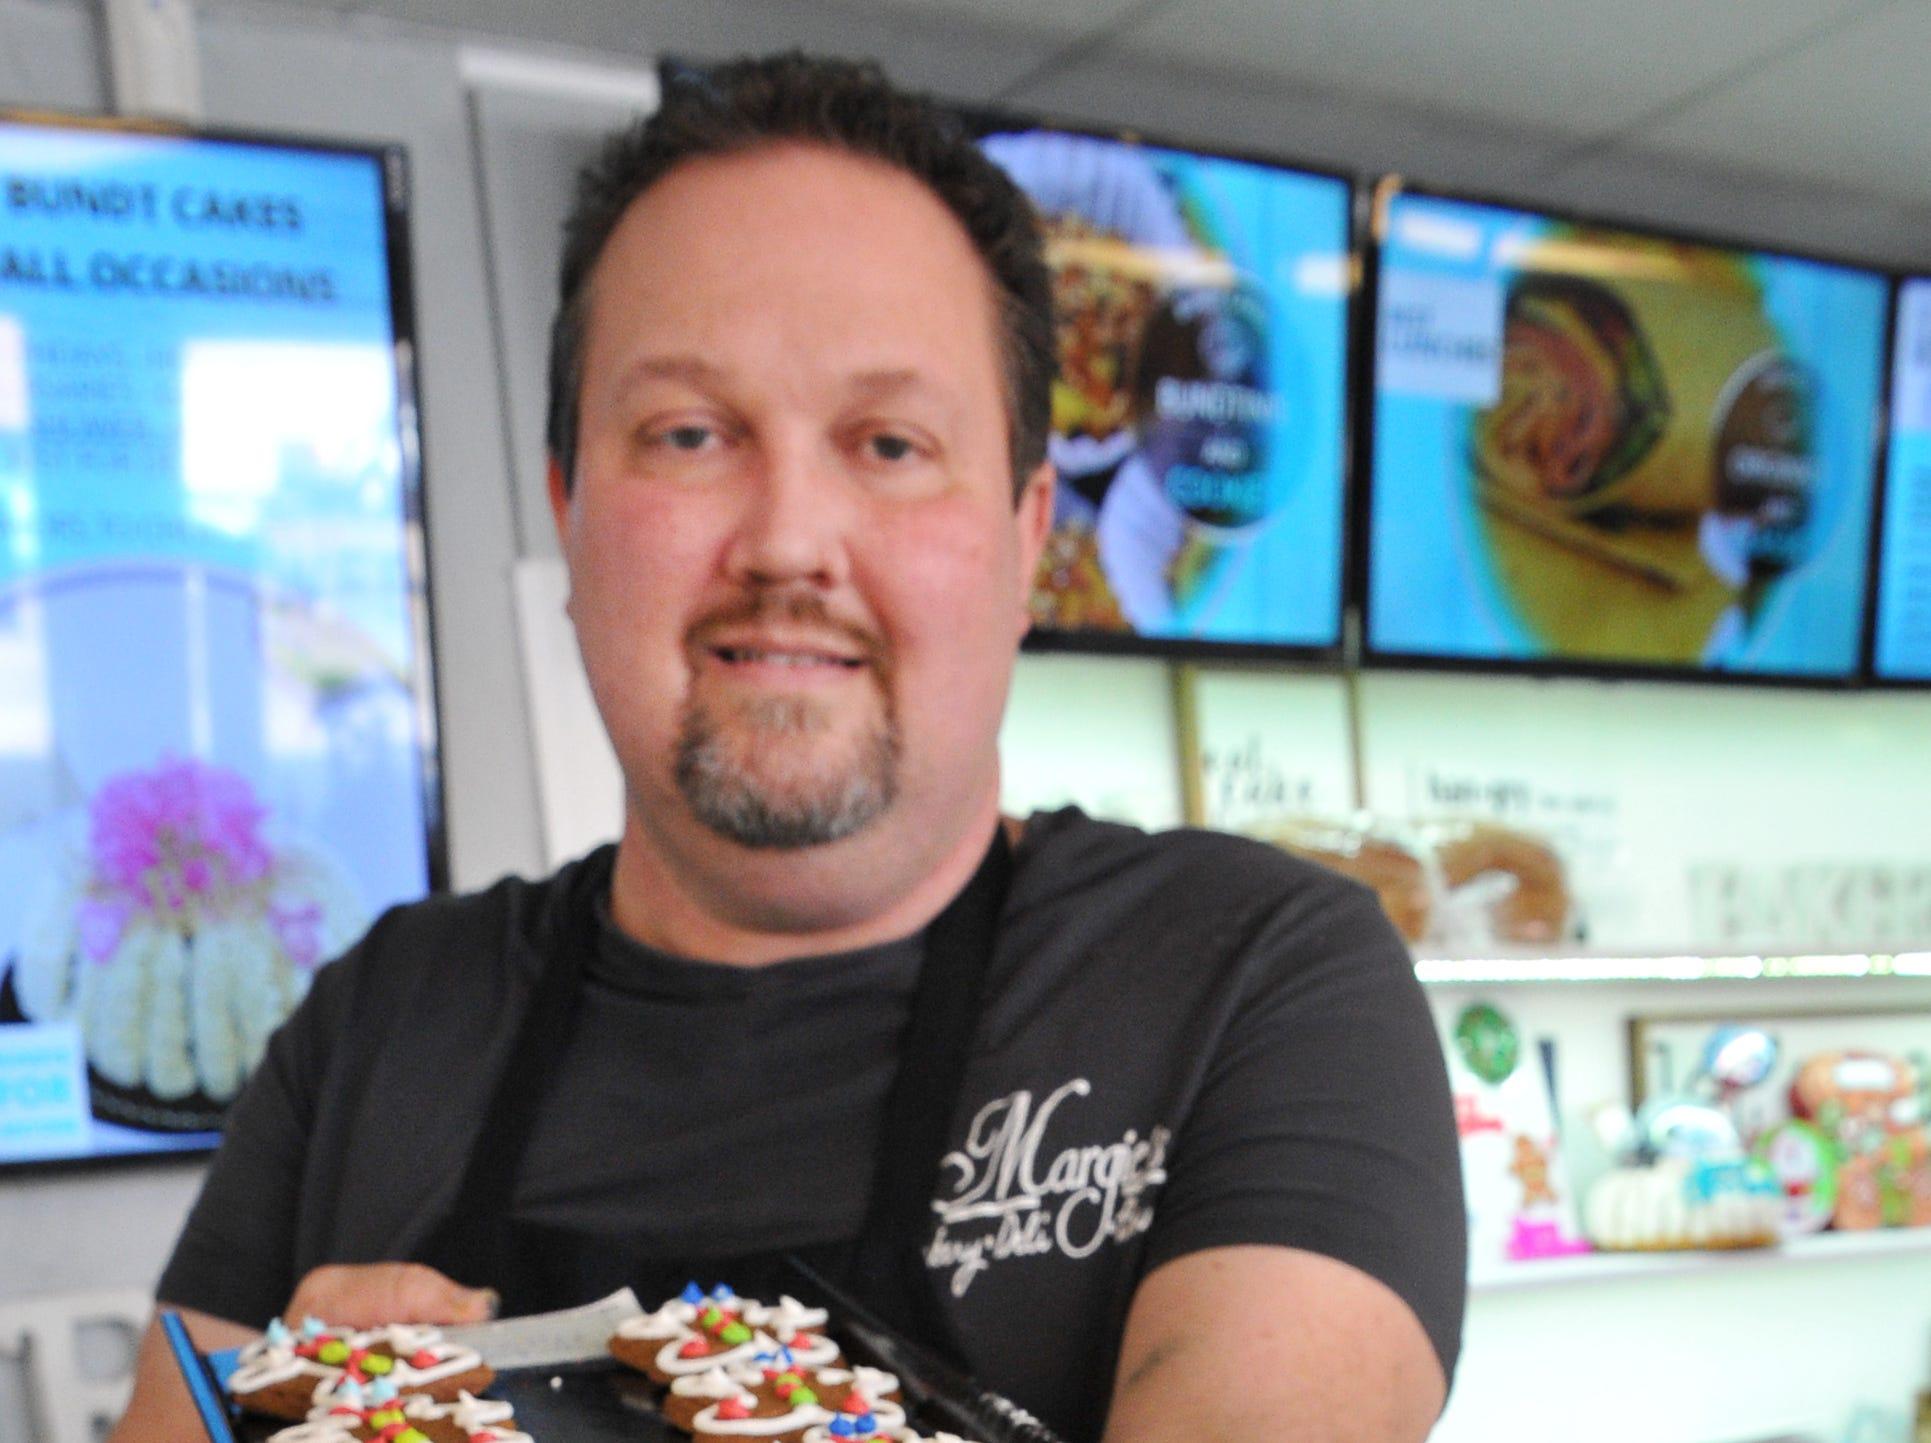 Margie's Sweet Shop, Owner, Michael Gerstner displays one of his bakery's most popular treats, Gingerbread Boys.